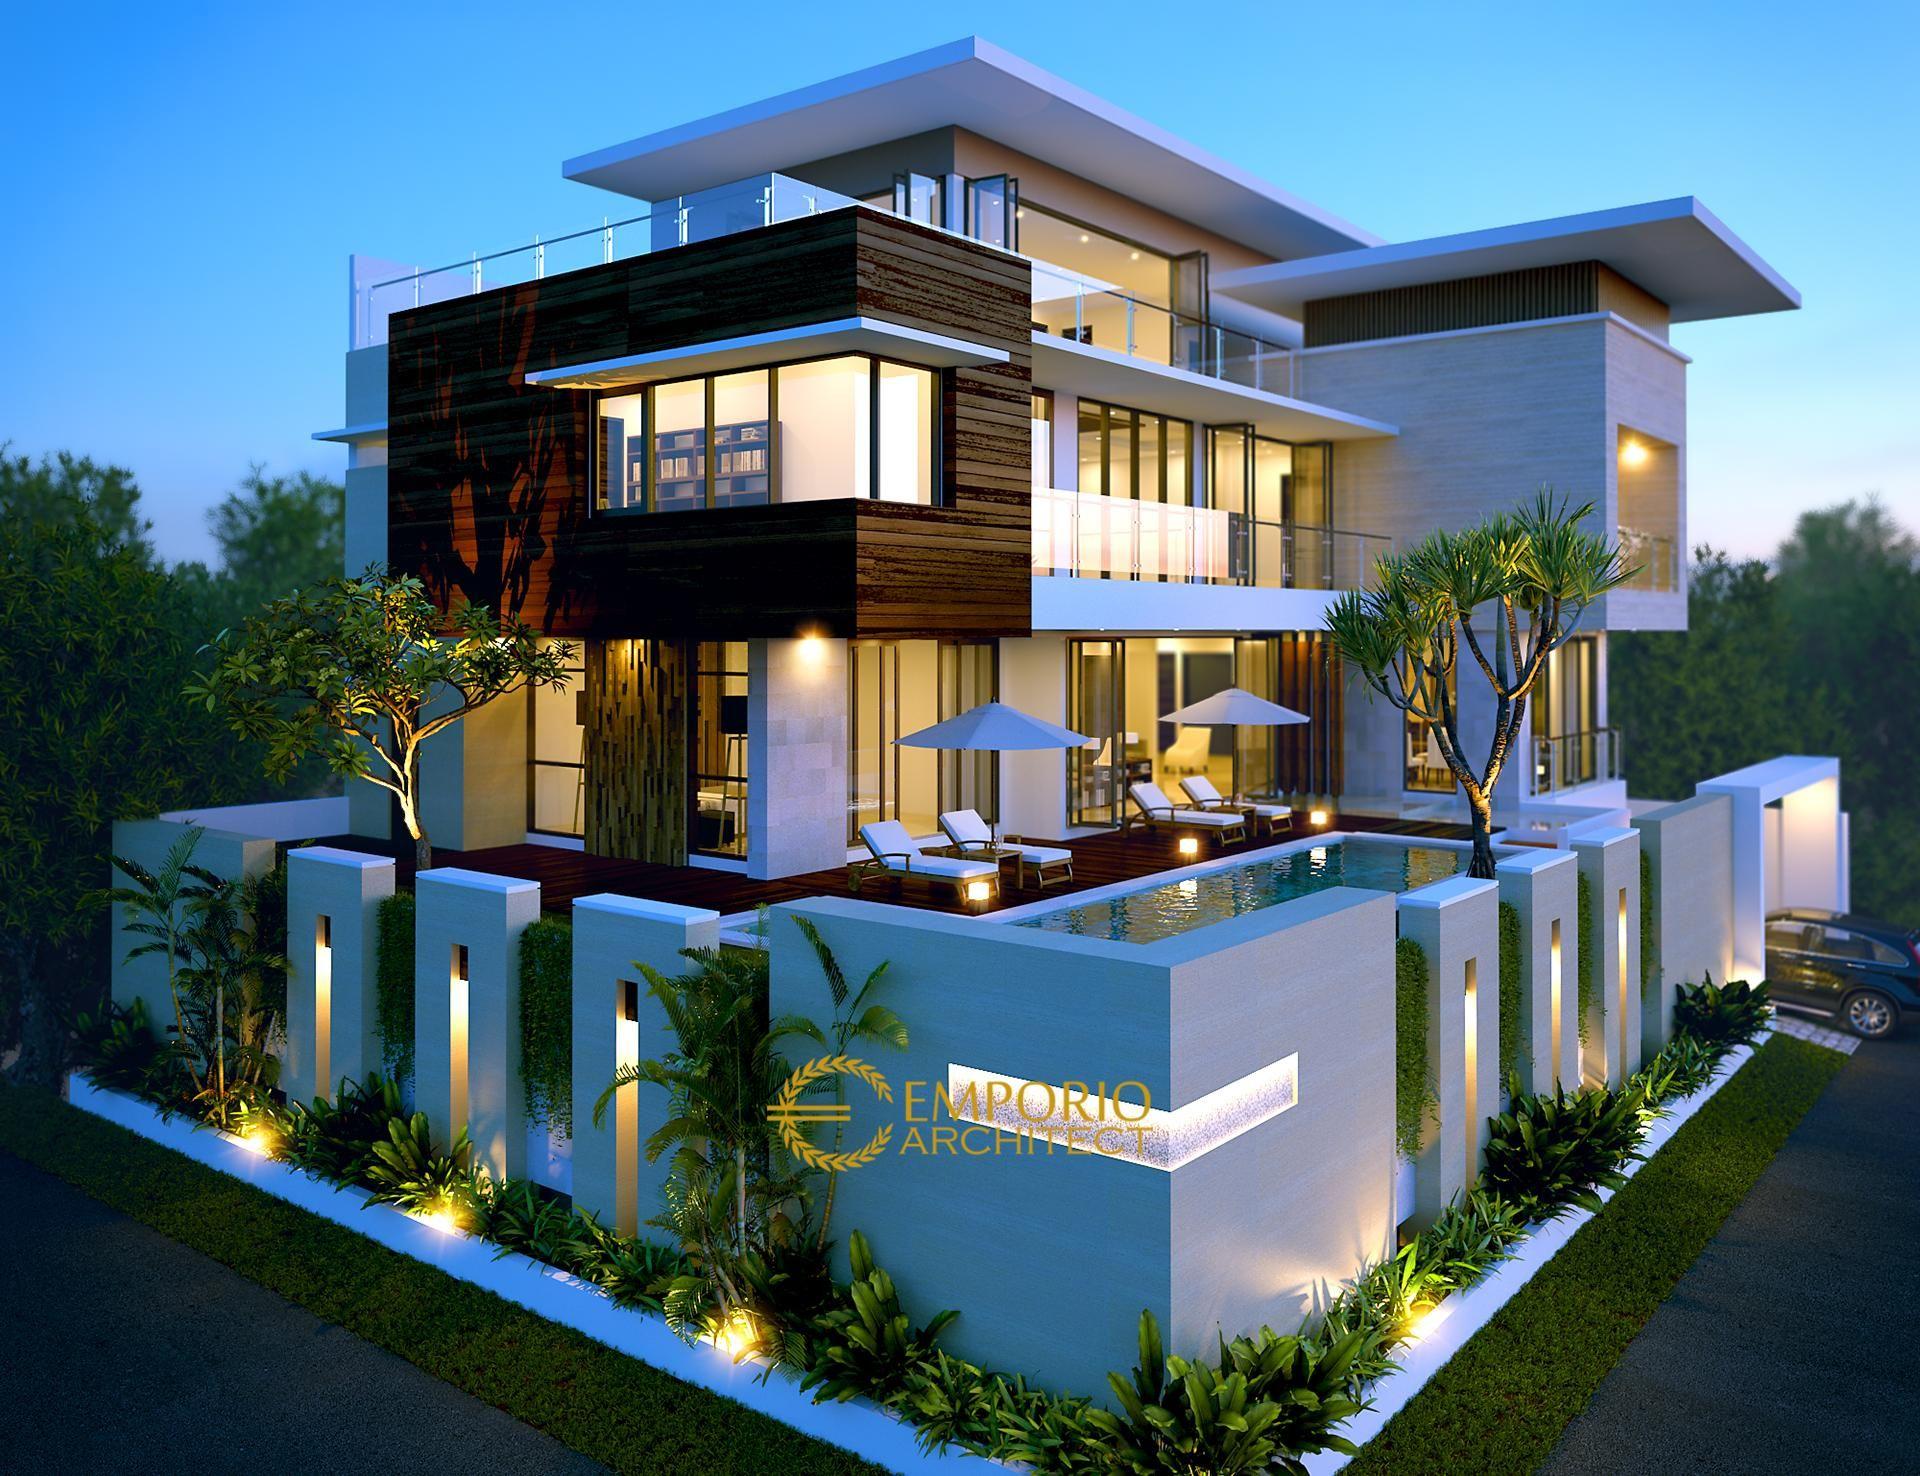 Mr Alex Modern House 3 Floors Design Jakarta Emporio Architect In 2020 Front Elevation Designs House Designs Exterior Flat Roof House Designs